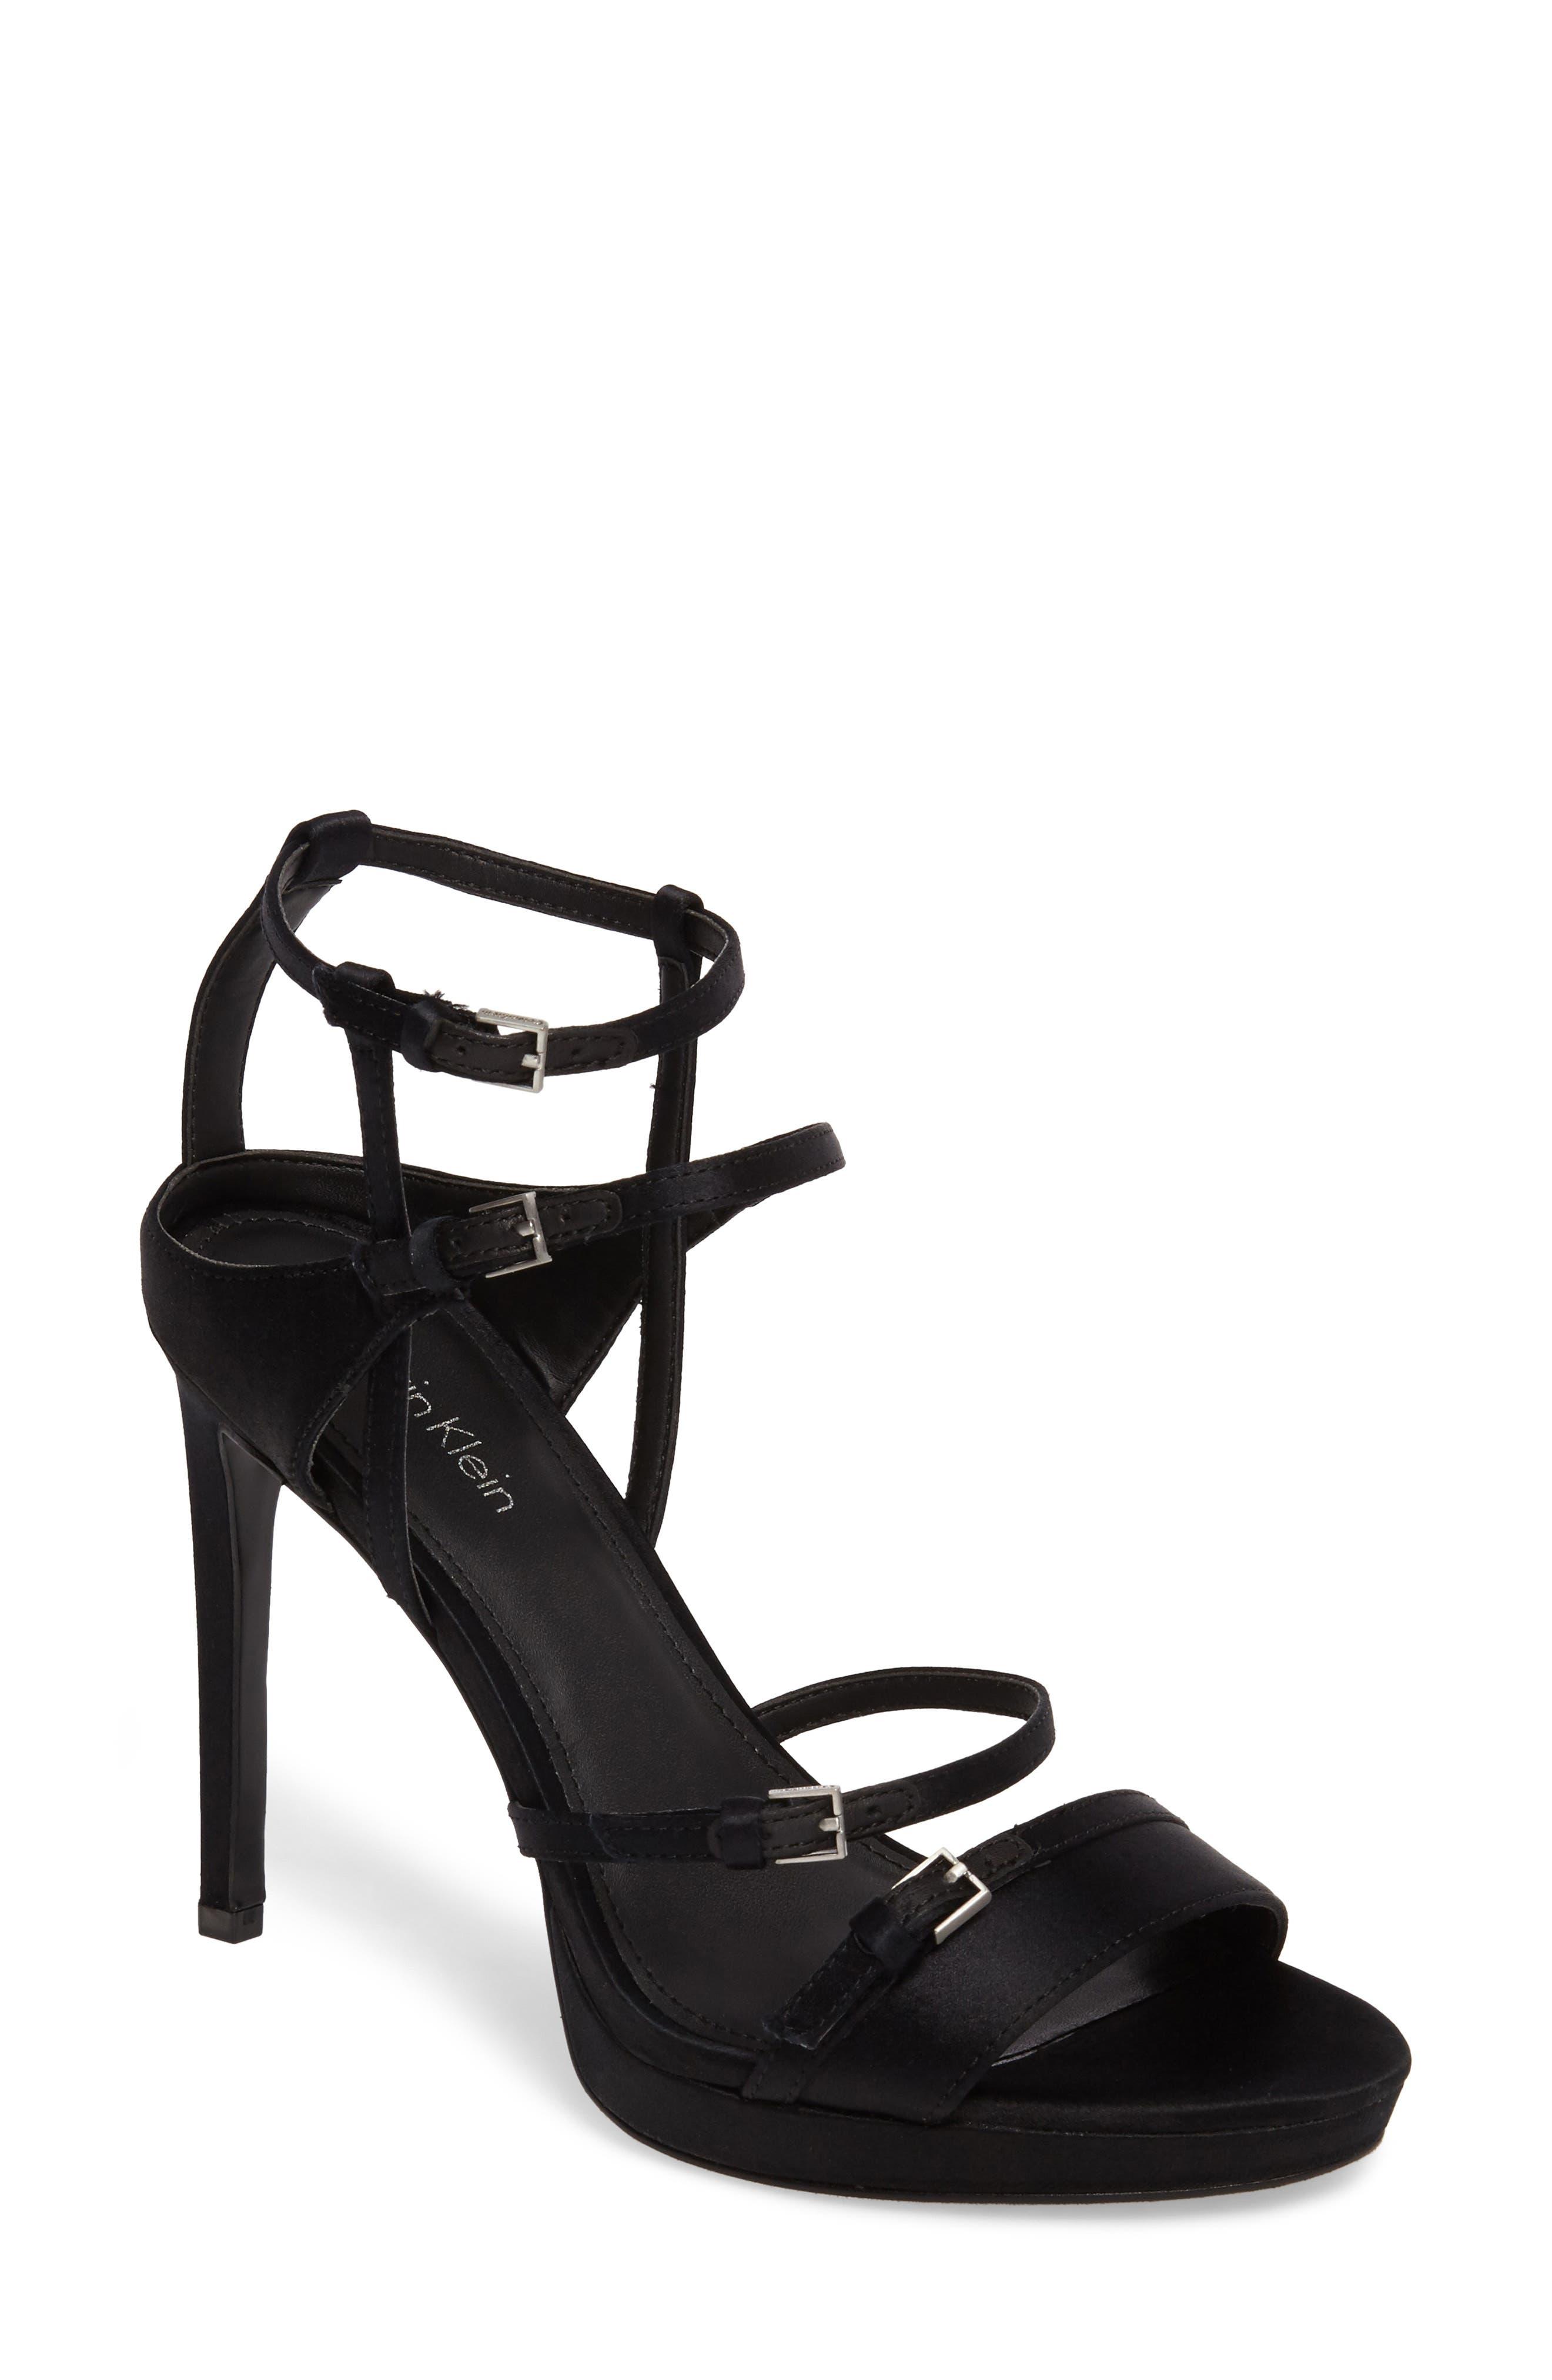 Alternate Image 1 Selected - Calvin Klein Shantell Strappy Platform Sandal (Women)